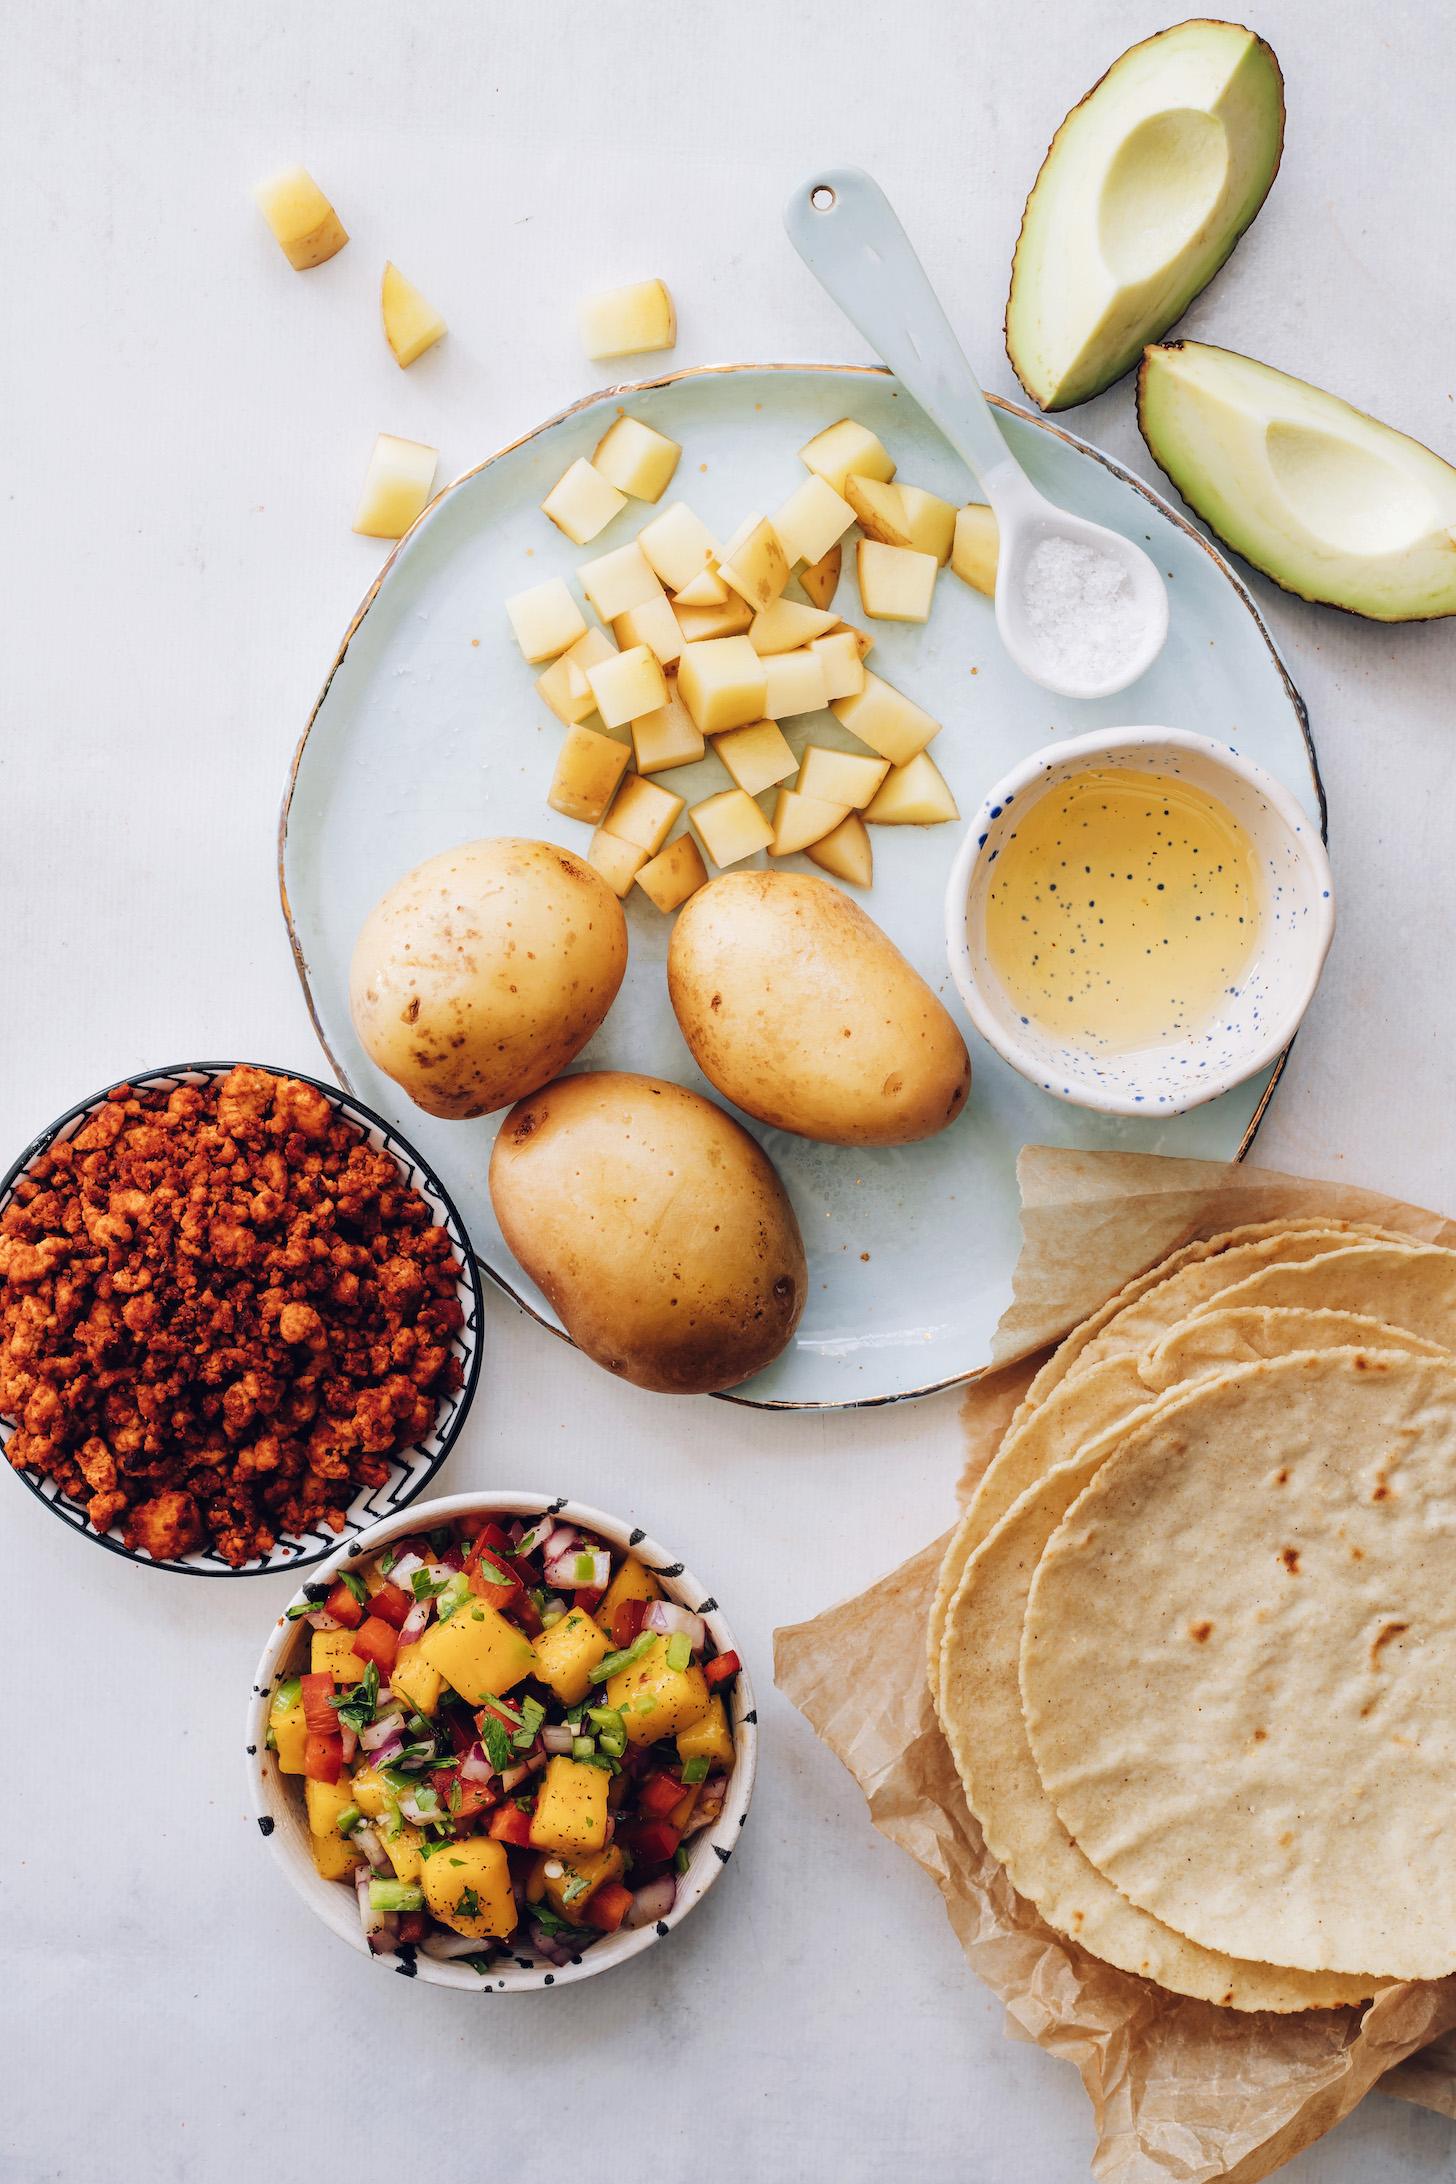 Potatoes, avocado, salt, avocado oil, tortillas, salsa, and vegan chorizo